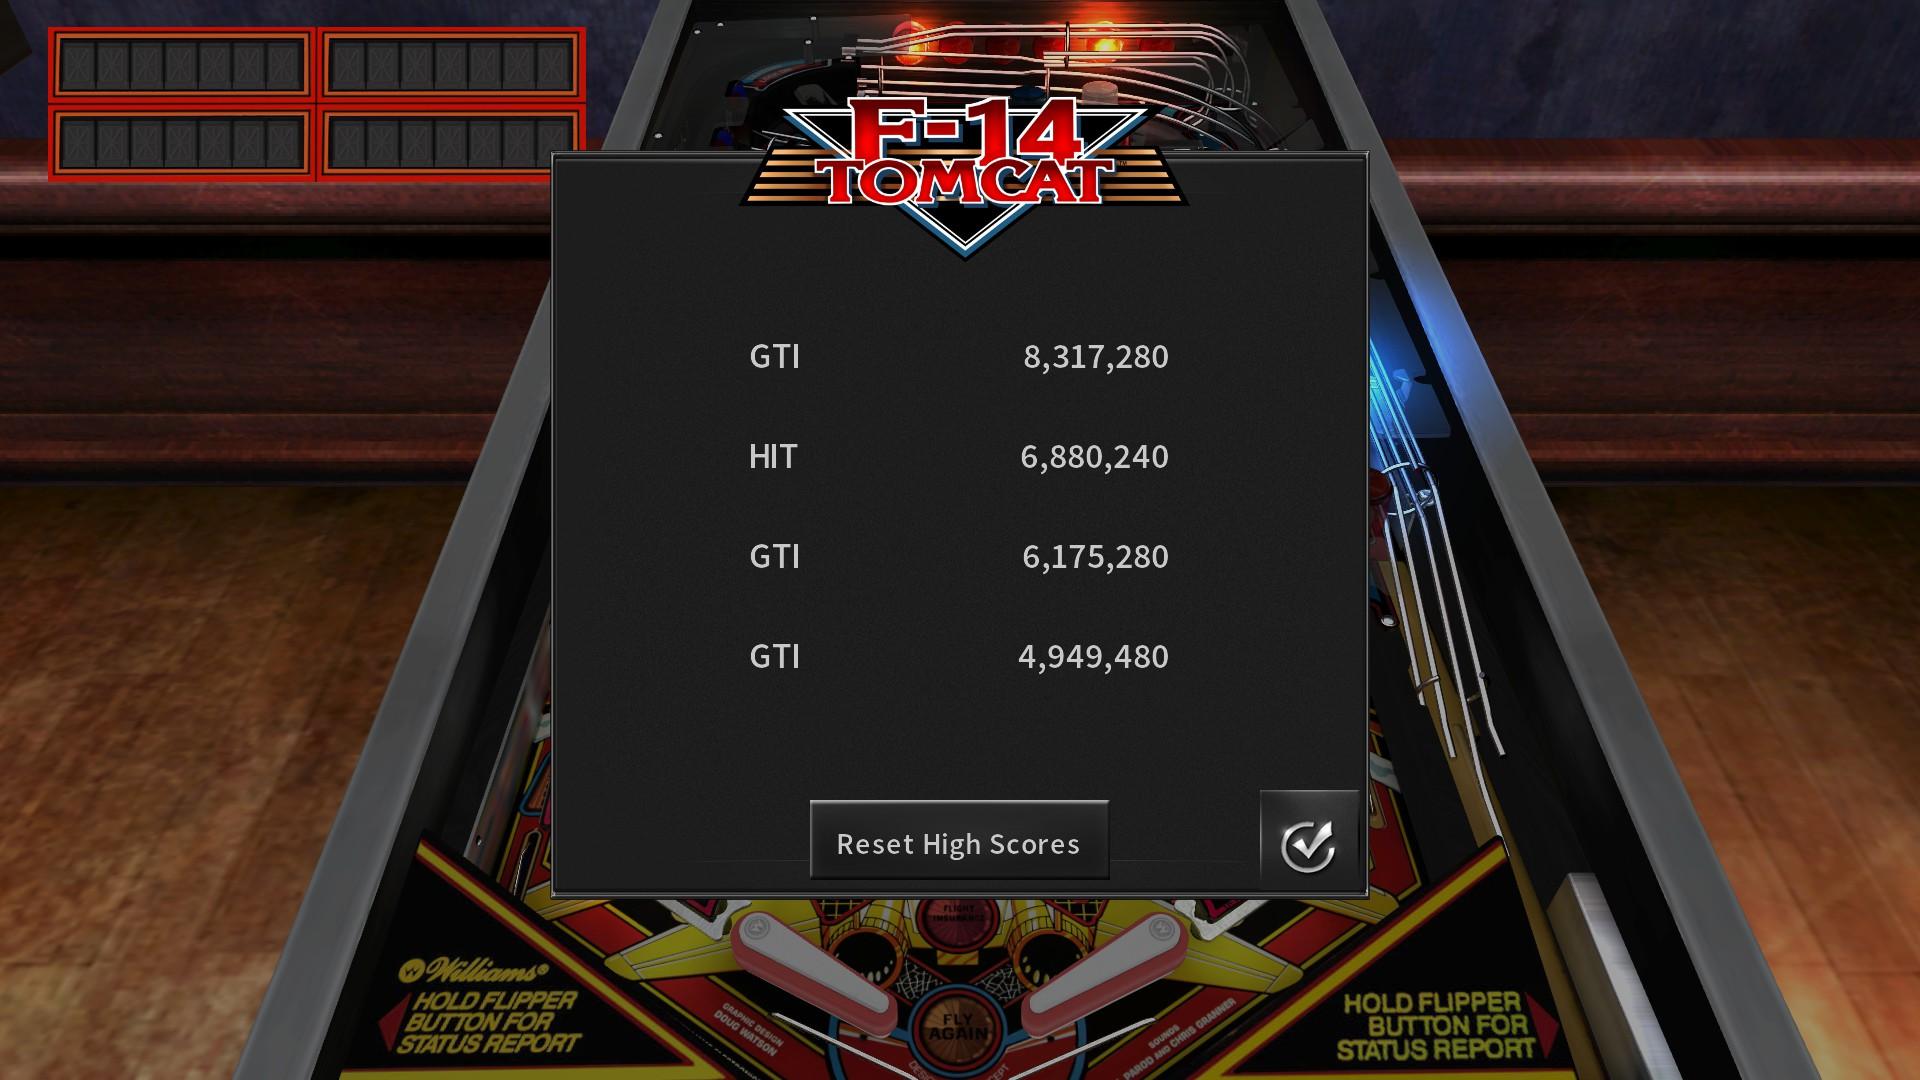 GTibel: Pinball Arcade: F-14 Tomcat (PC) 8,317,280 points on 2018-01-11 04:57:31